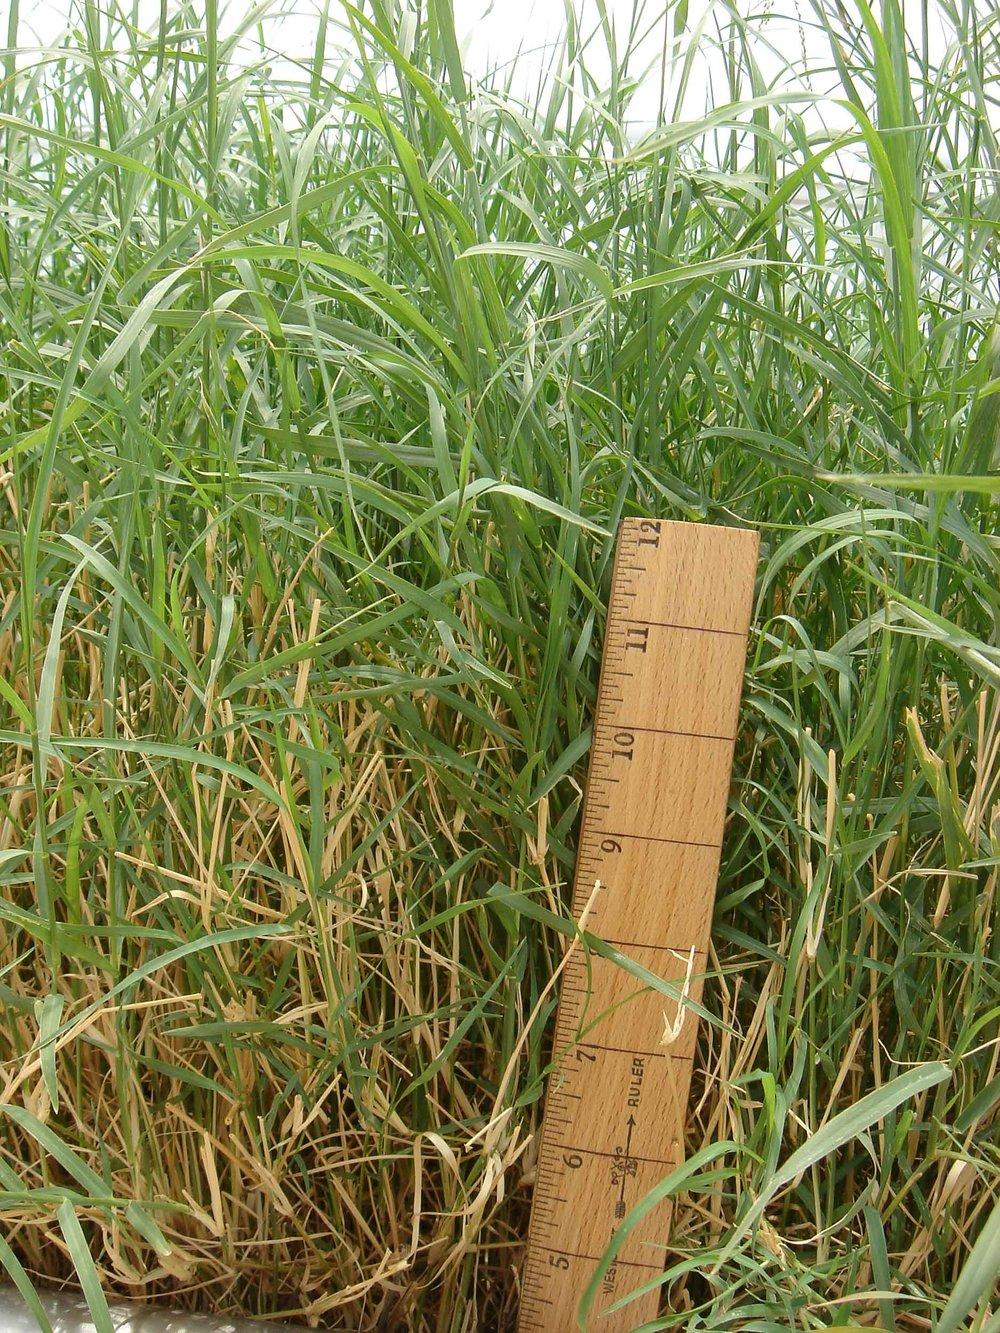 Nk37 Giant Bermuda Grass